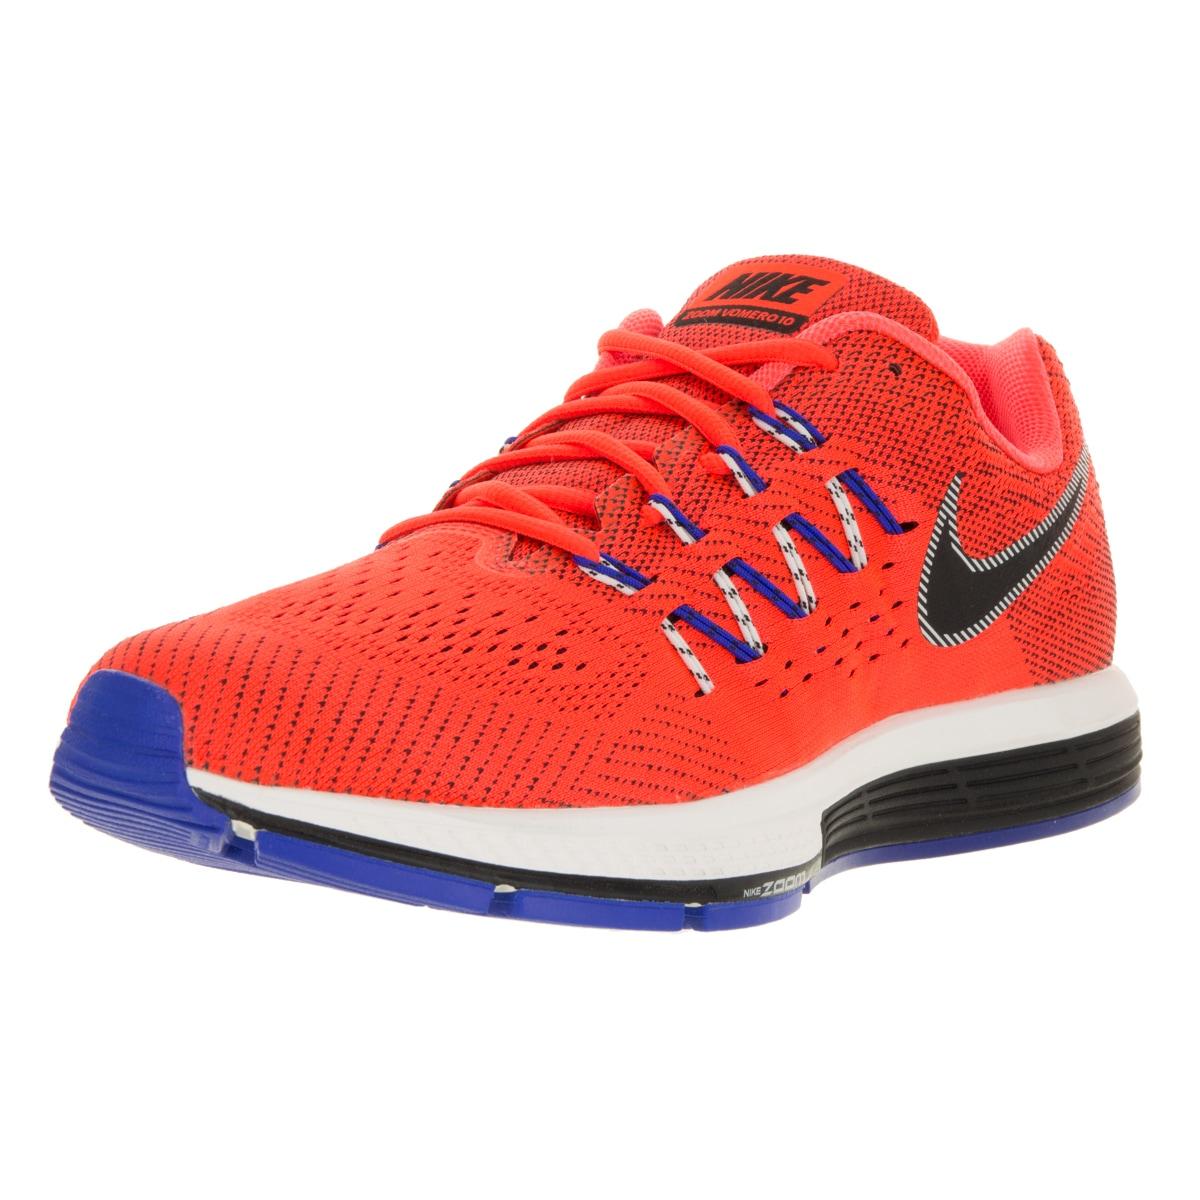 Nike Men's Air Zoom Vomero 10 Total Crimson/Black/ Runnin...